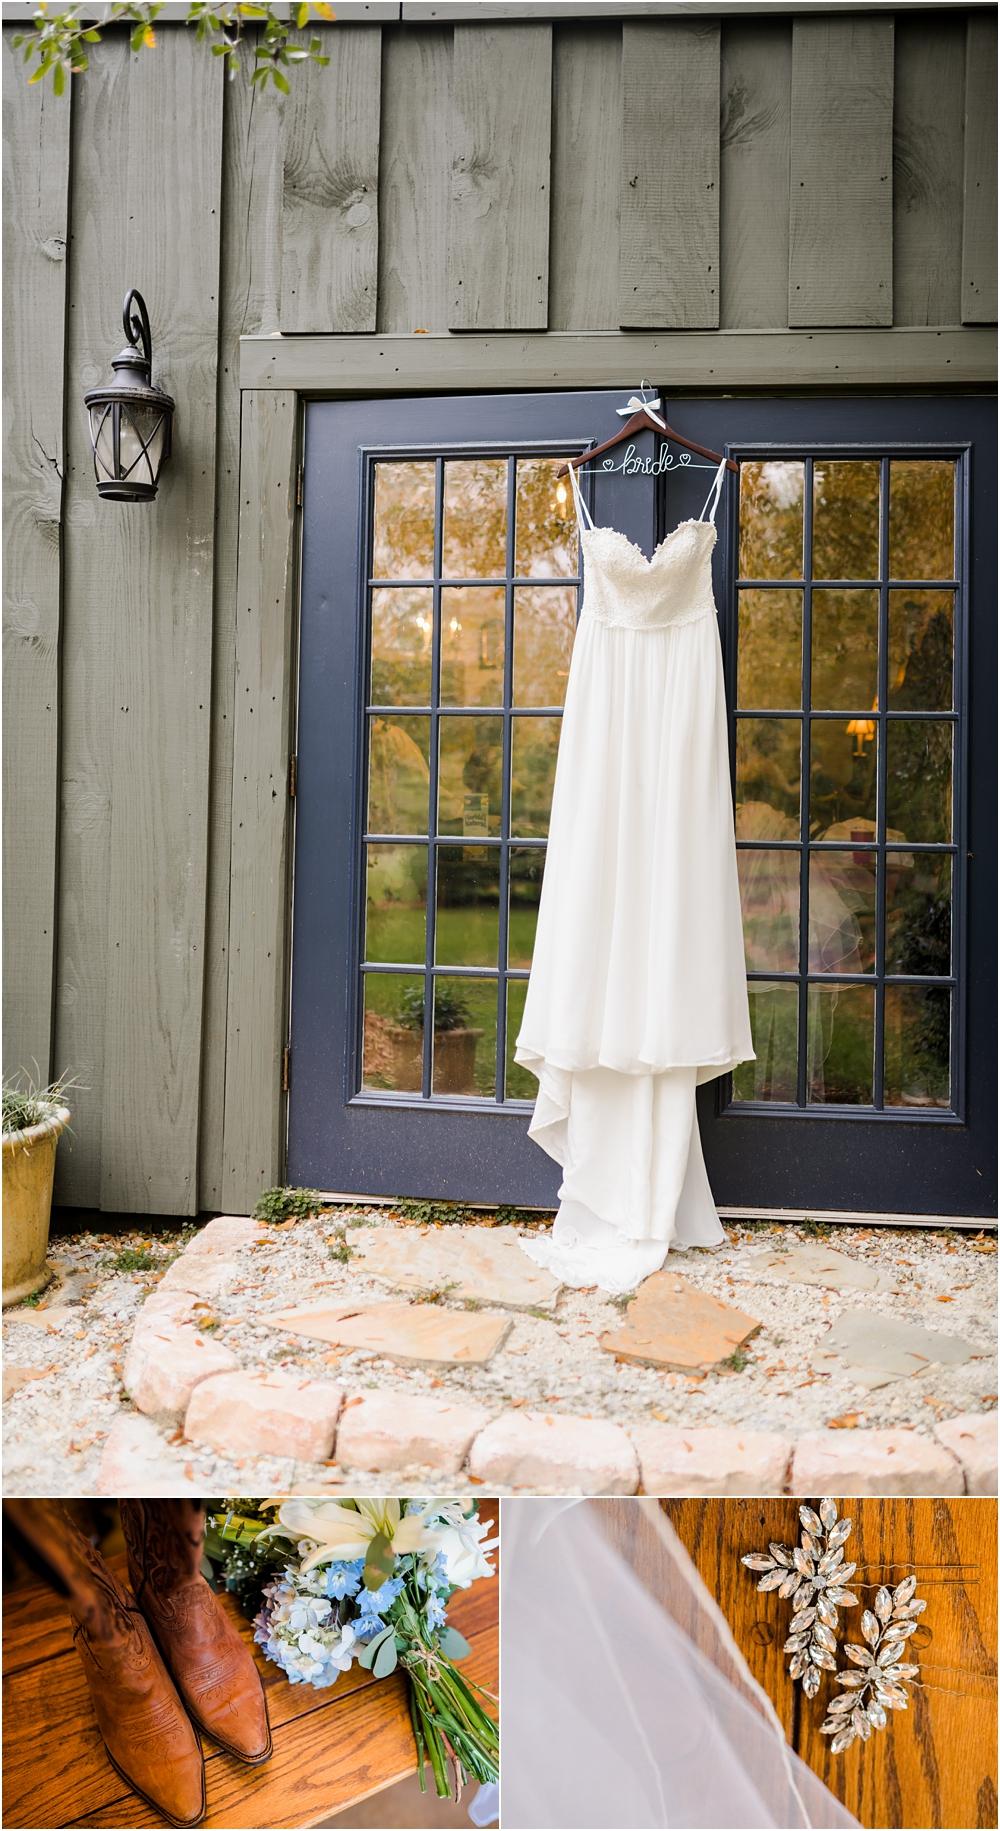 southern-lea-farms-wedding-kiersten-stevenson-photography-vernon-florida-wedding5.jpg